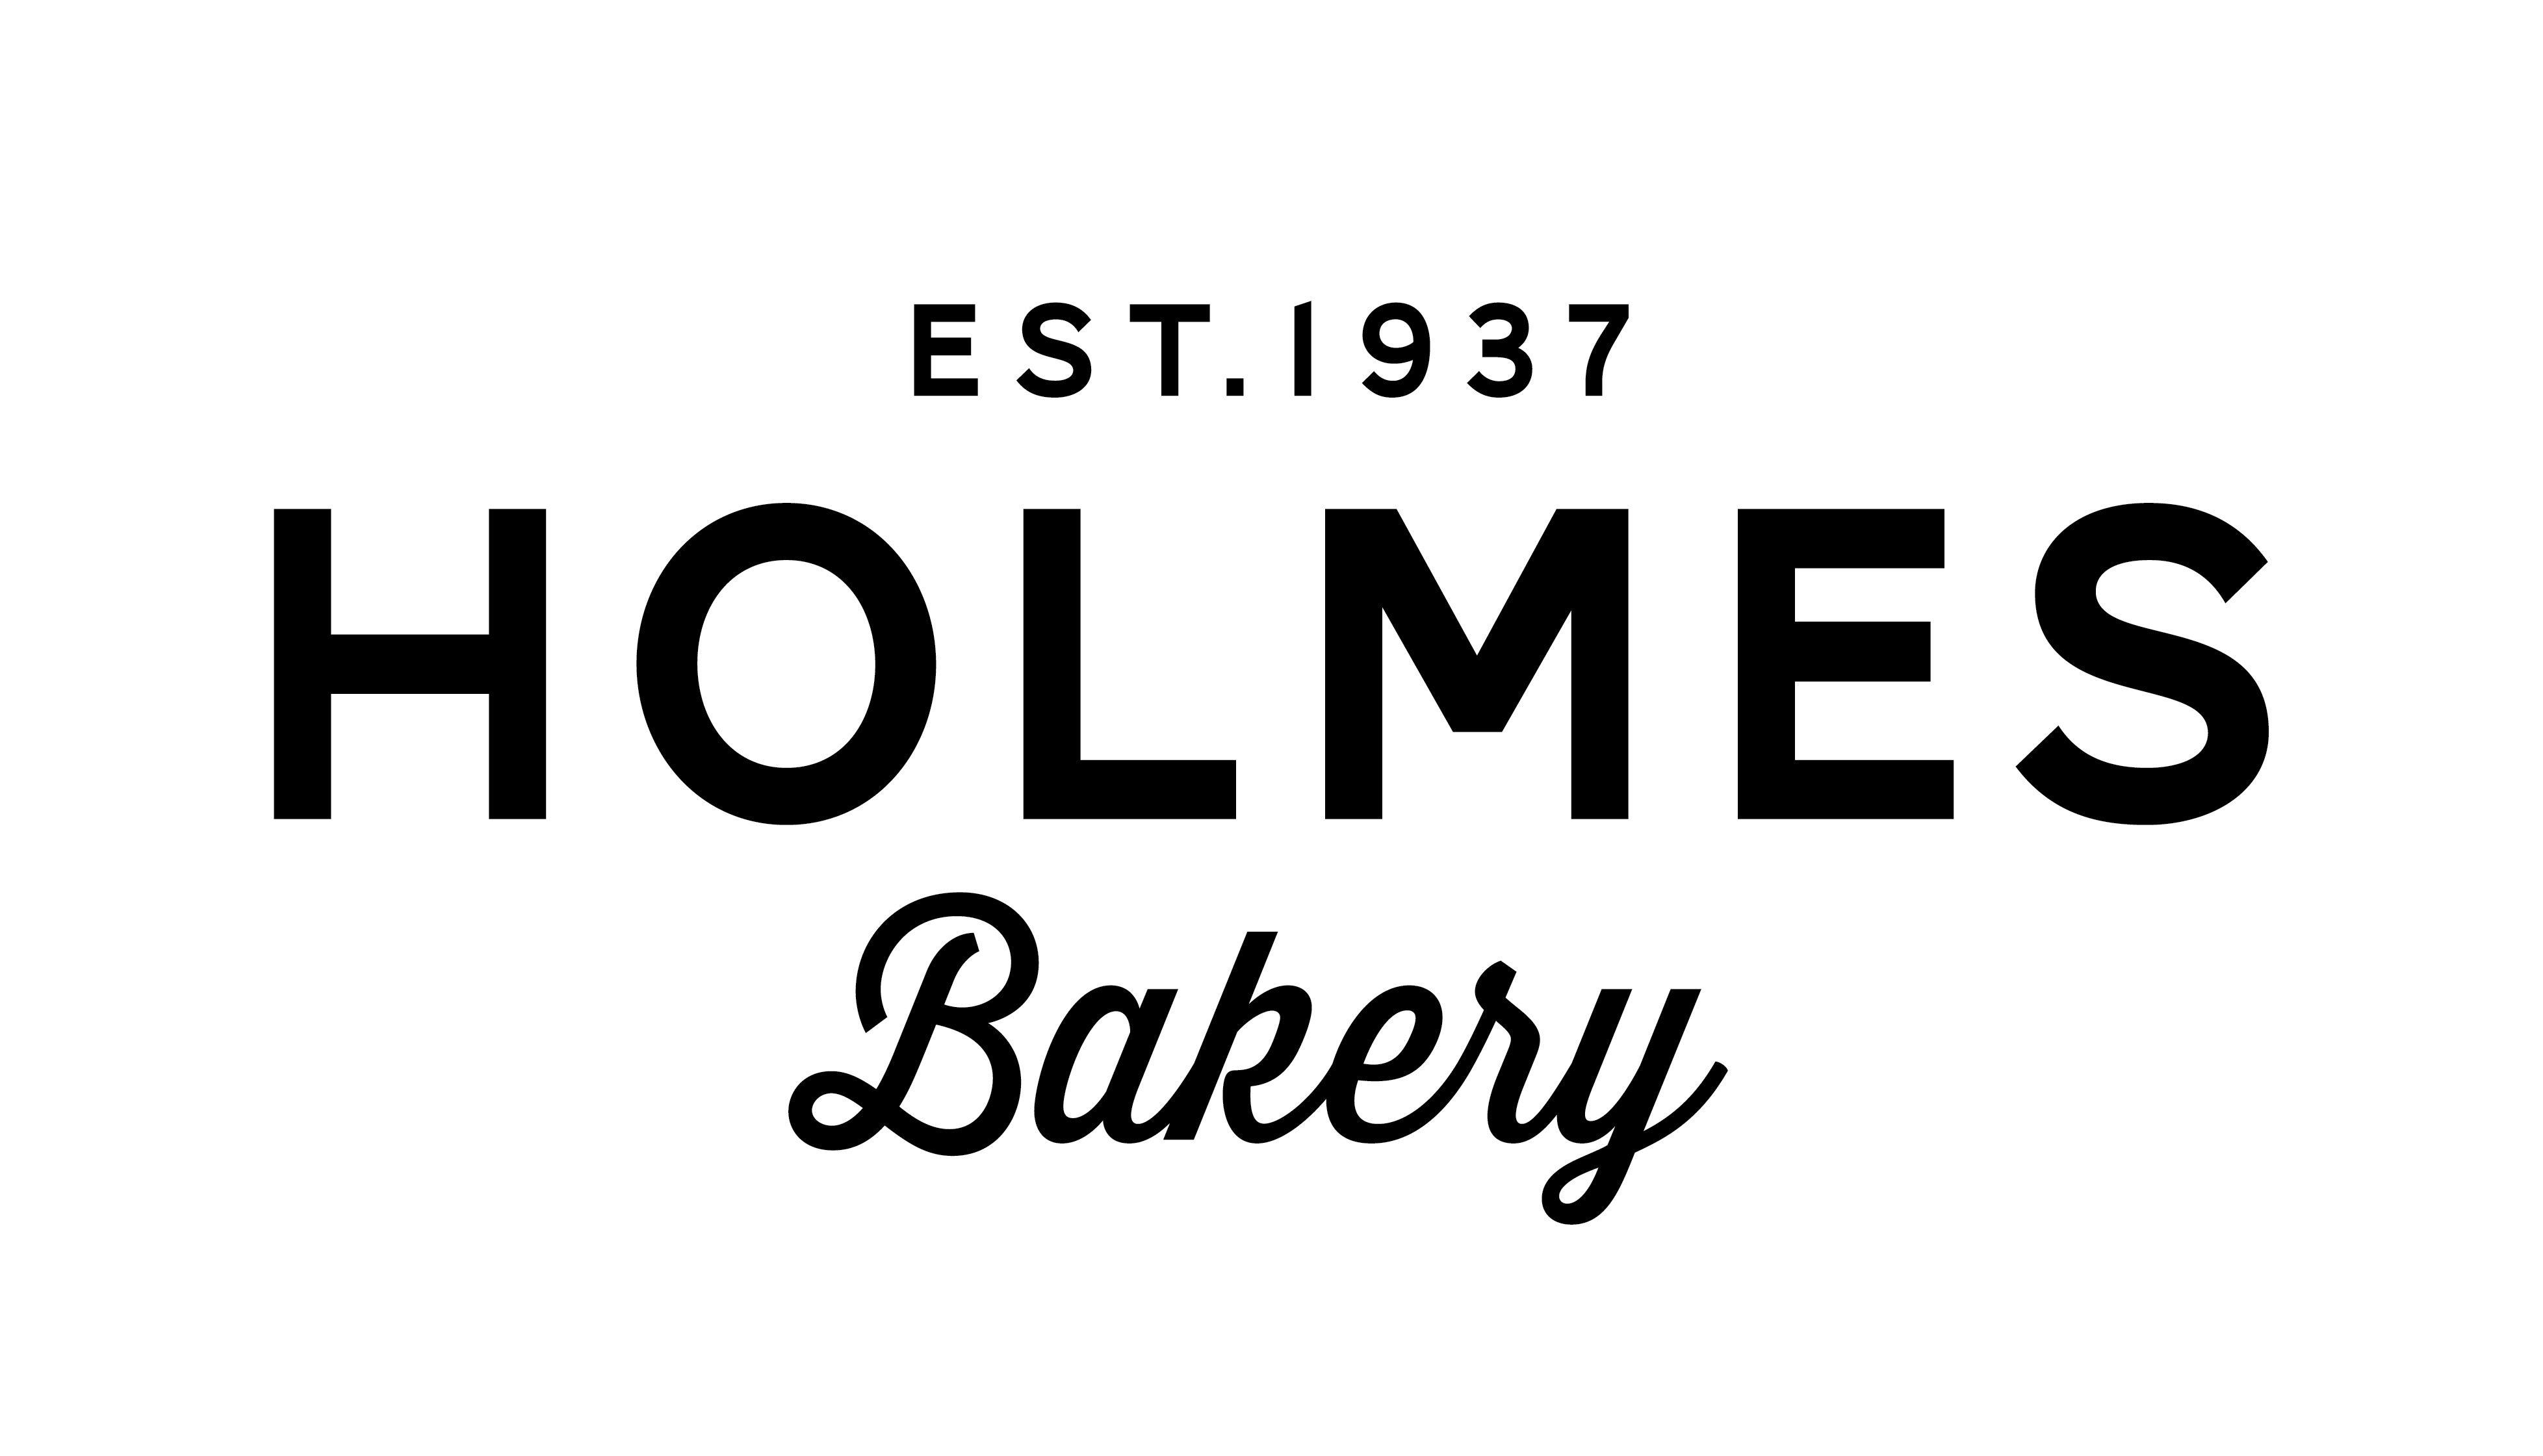 Holmes Bakery